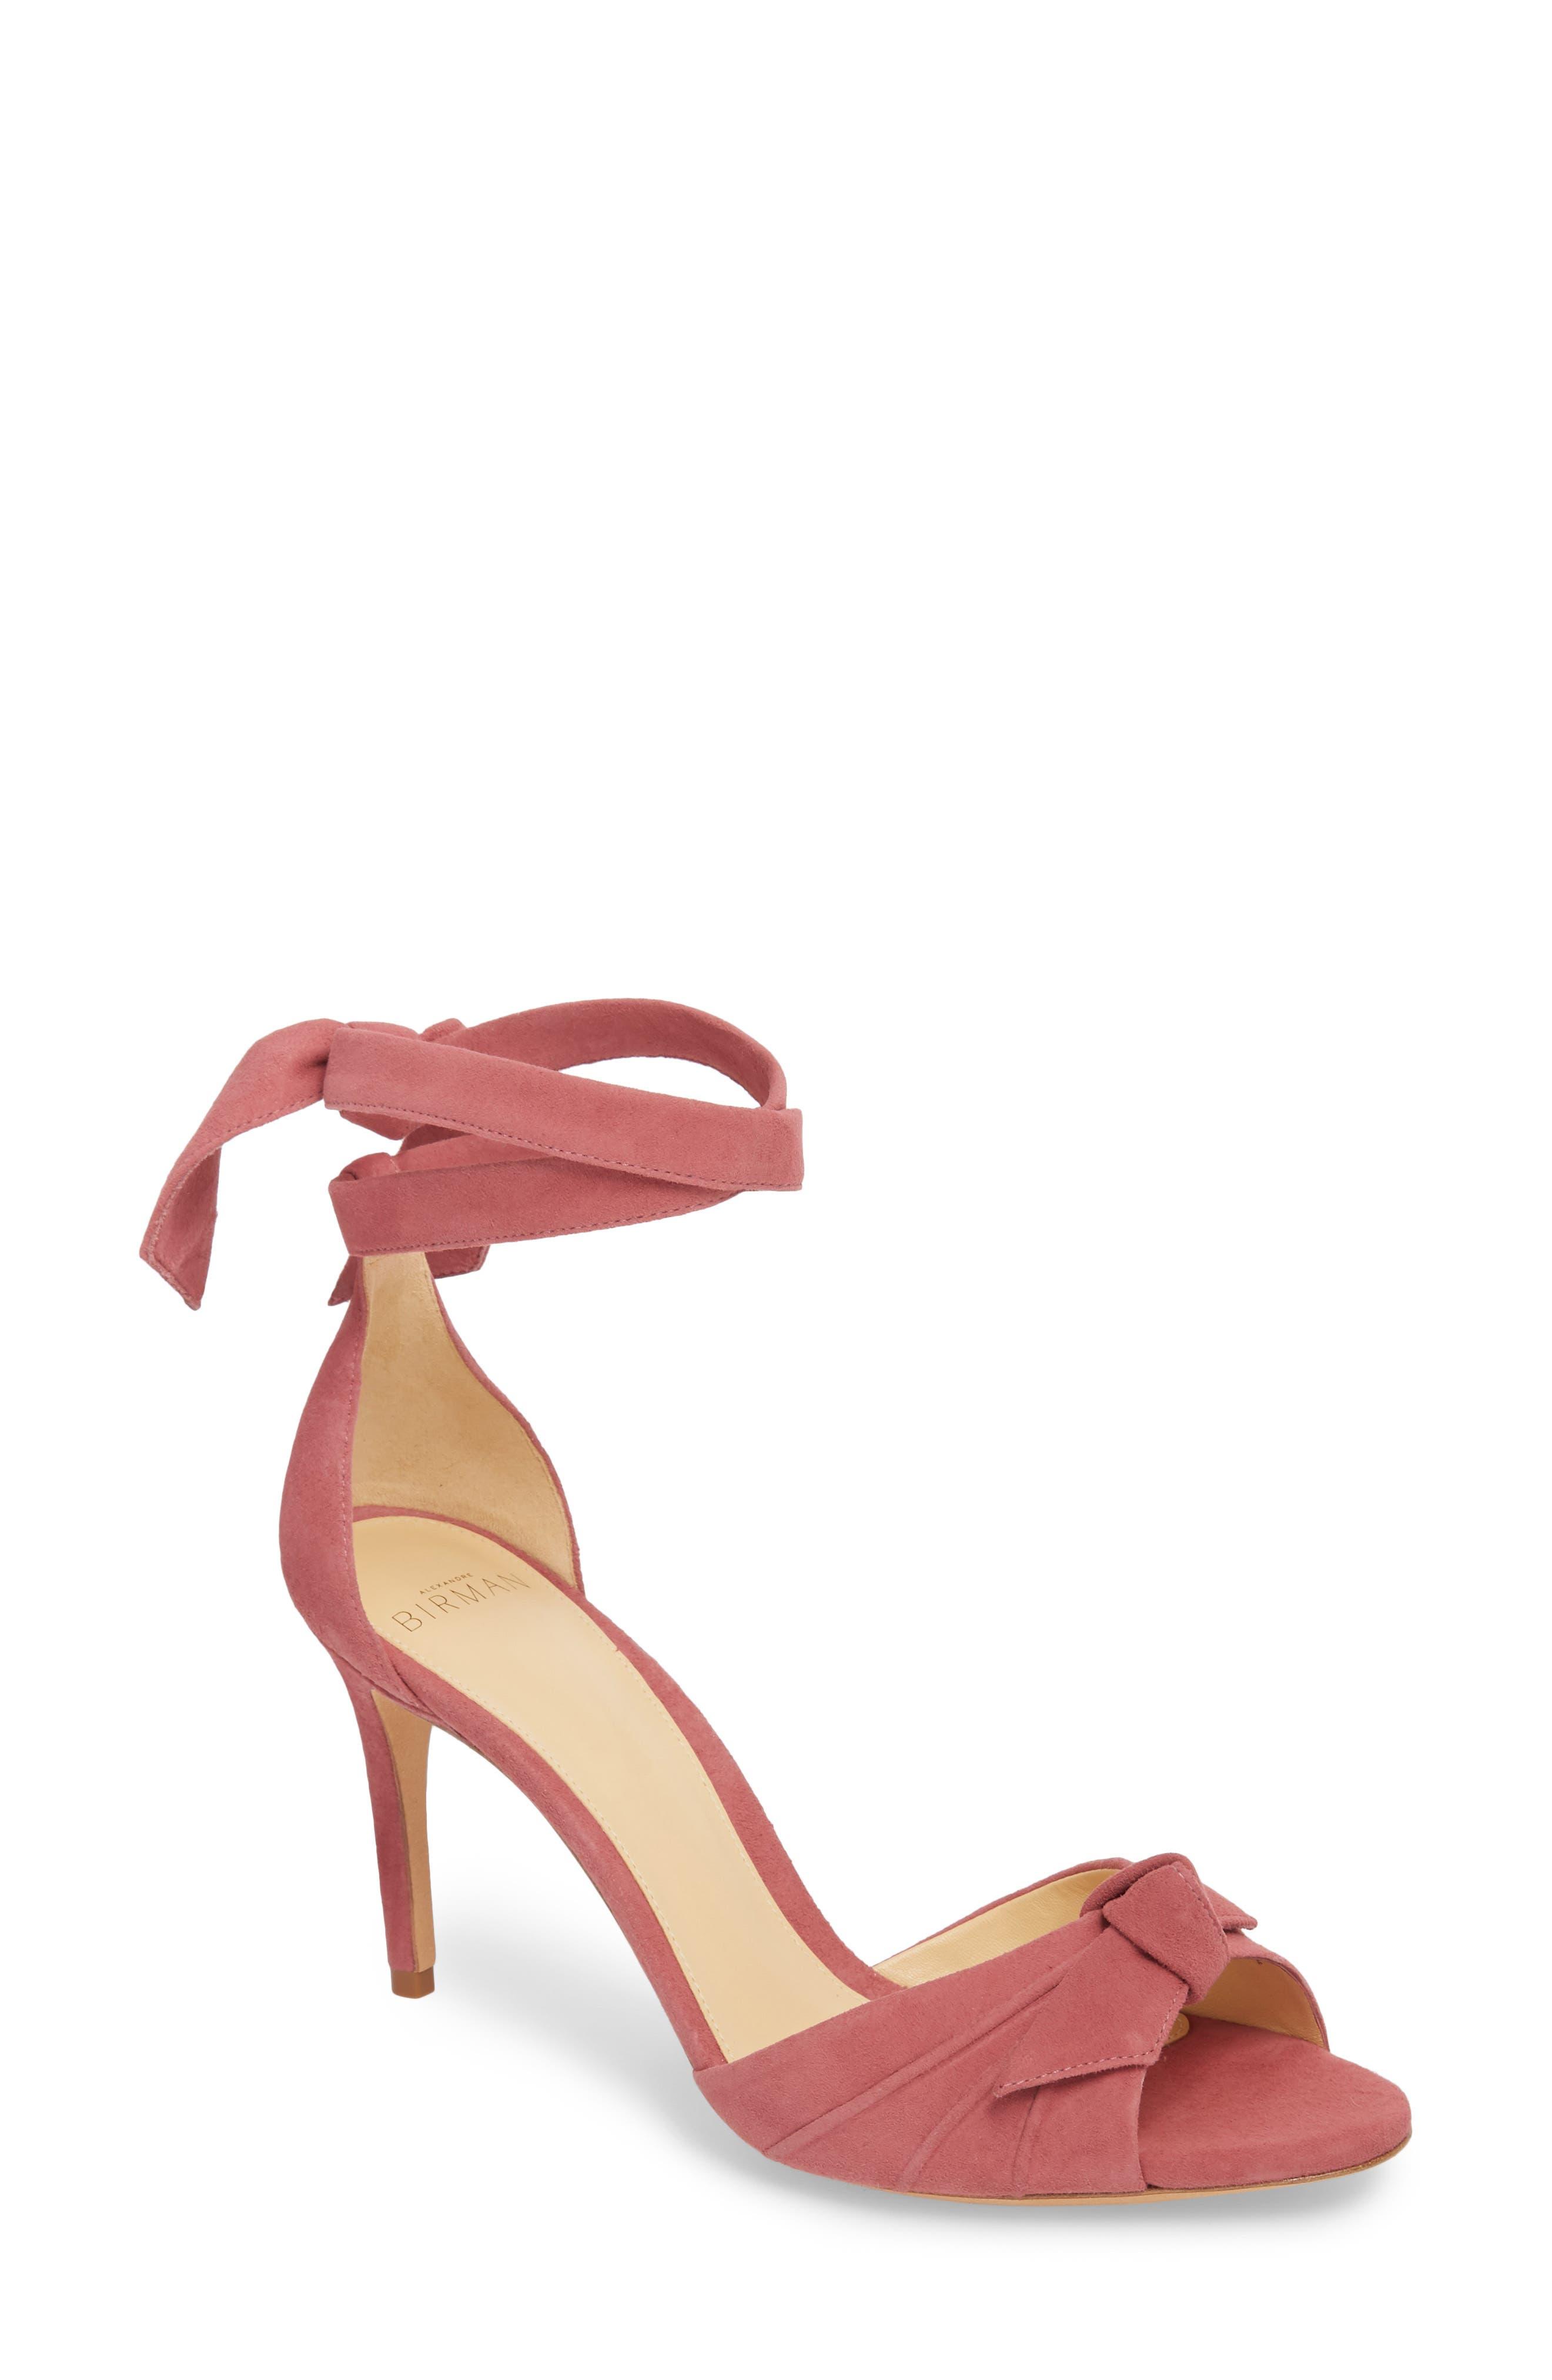 Clarita Ankle Tie Sandal,                             Main thumbnail 1, color,                             Dusty Rose